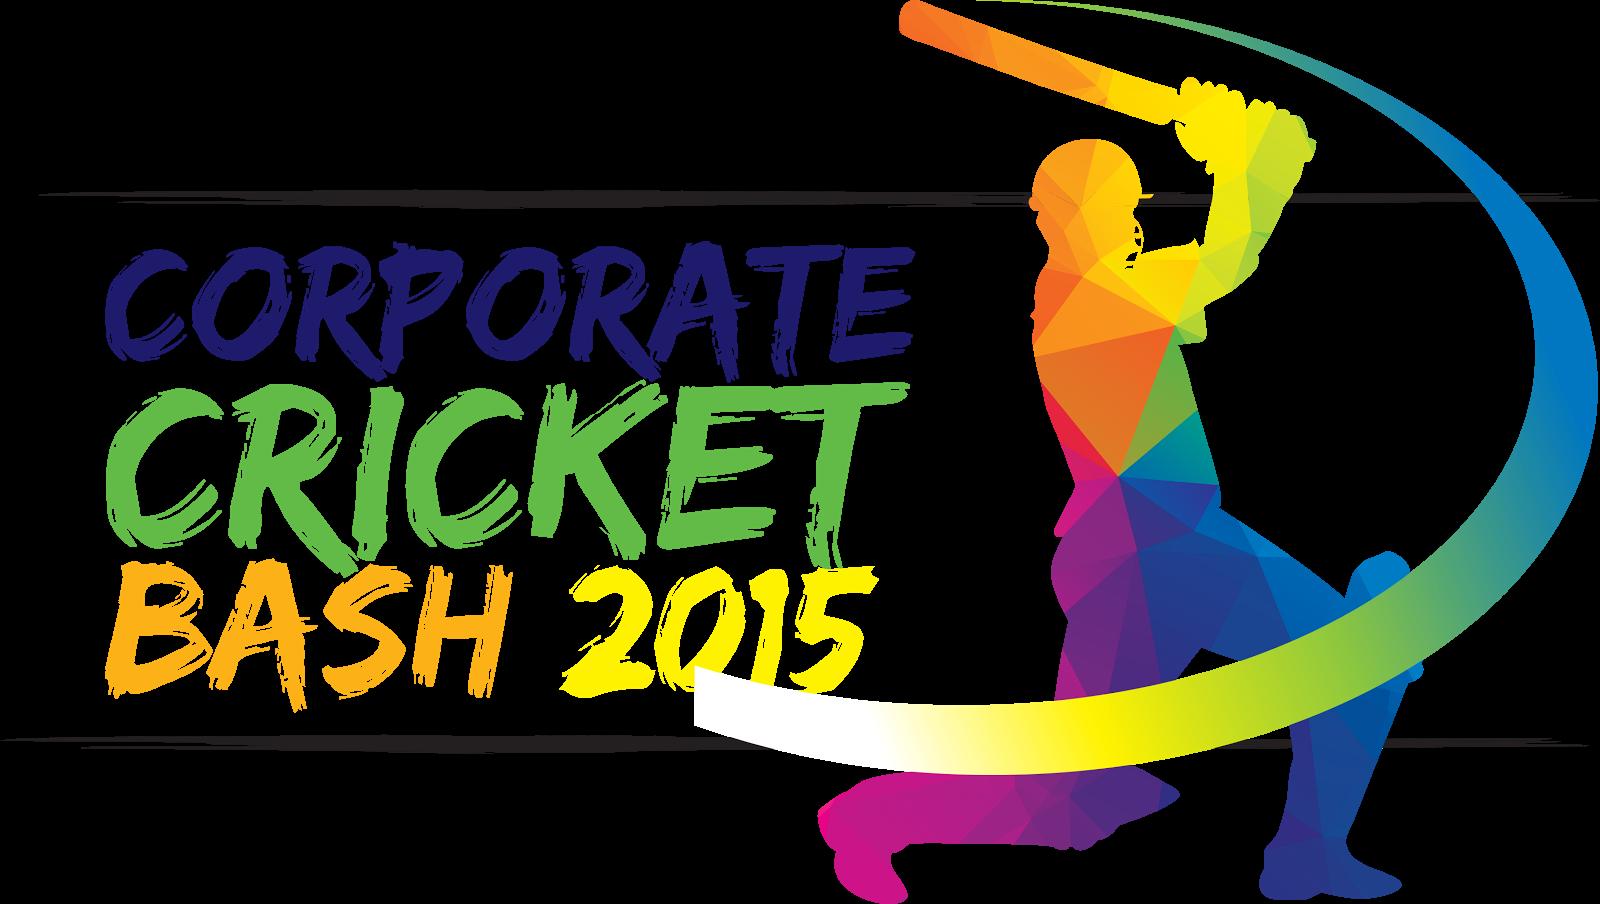 Corporate Cricket Bash